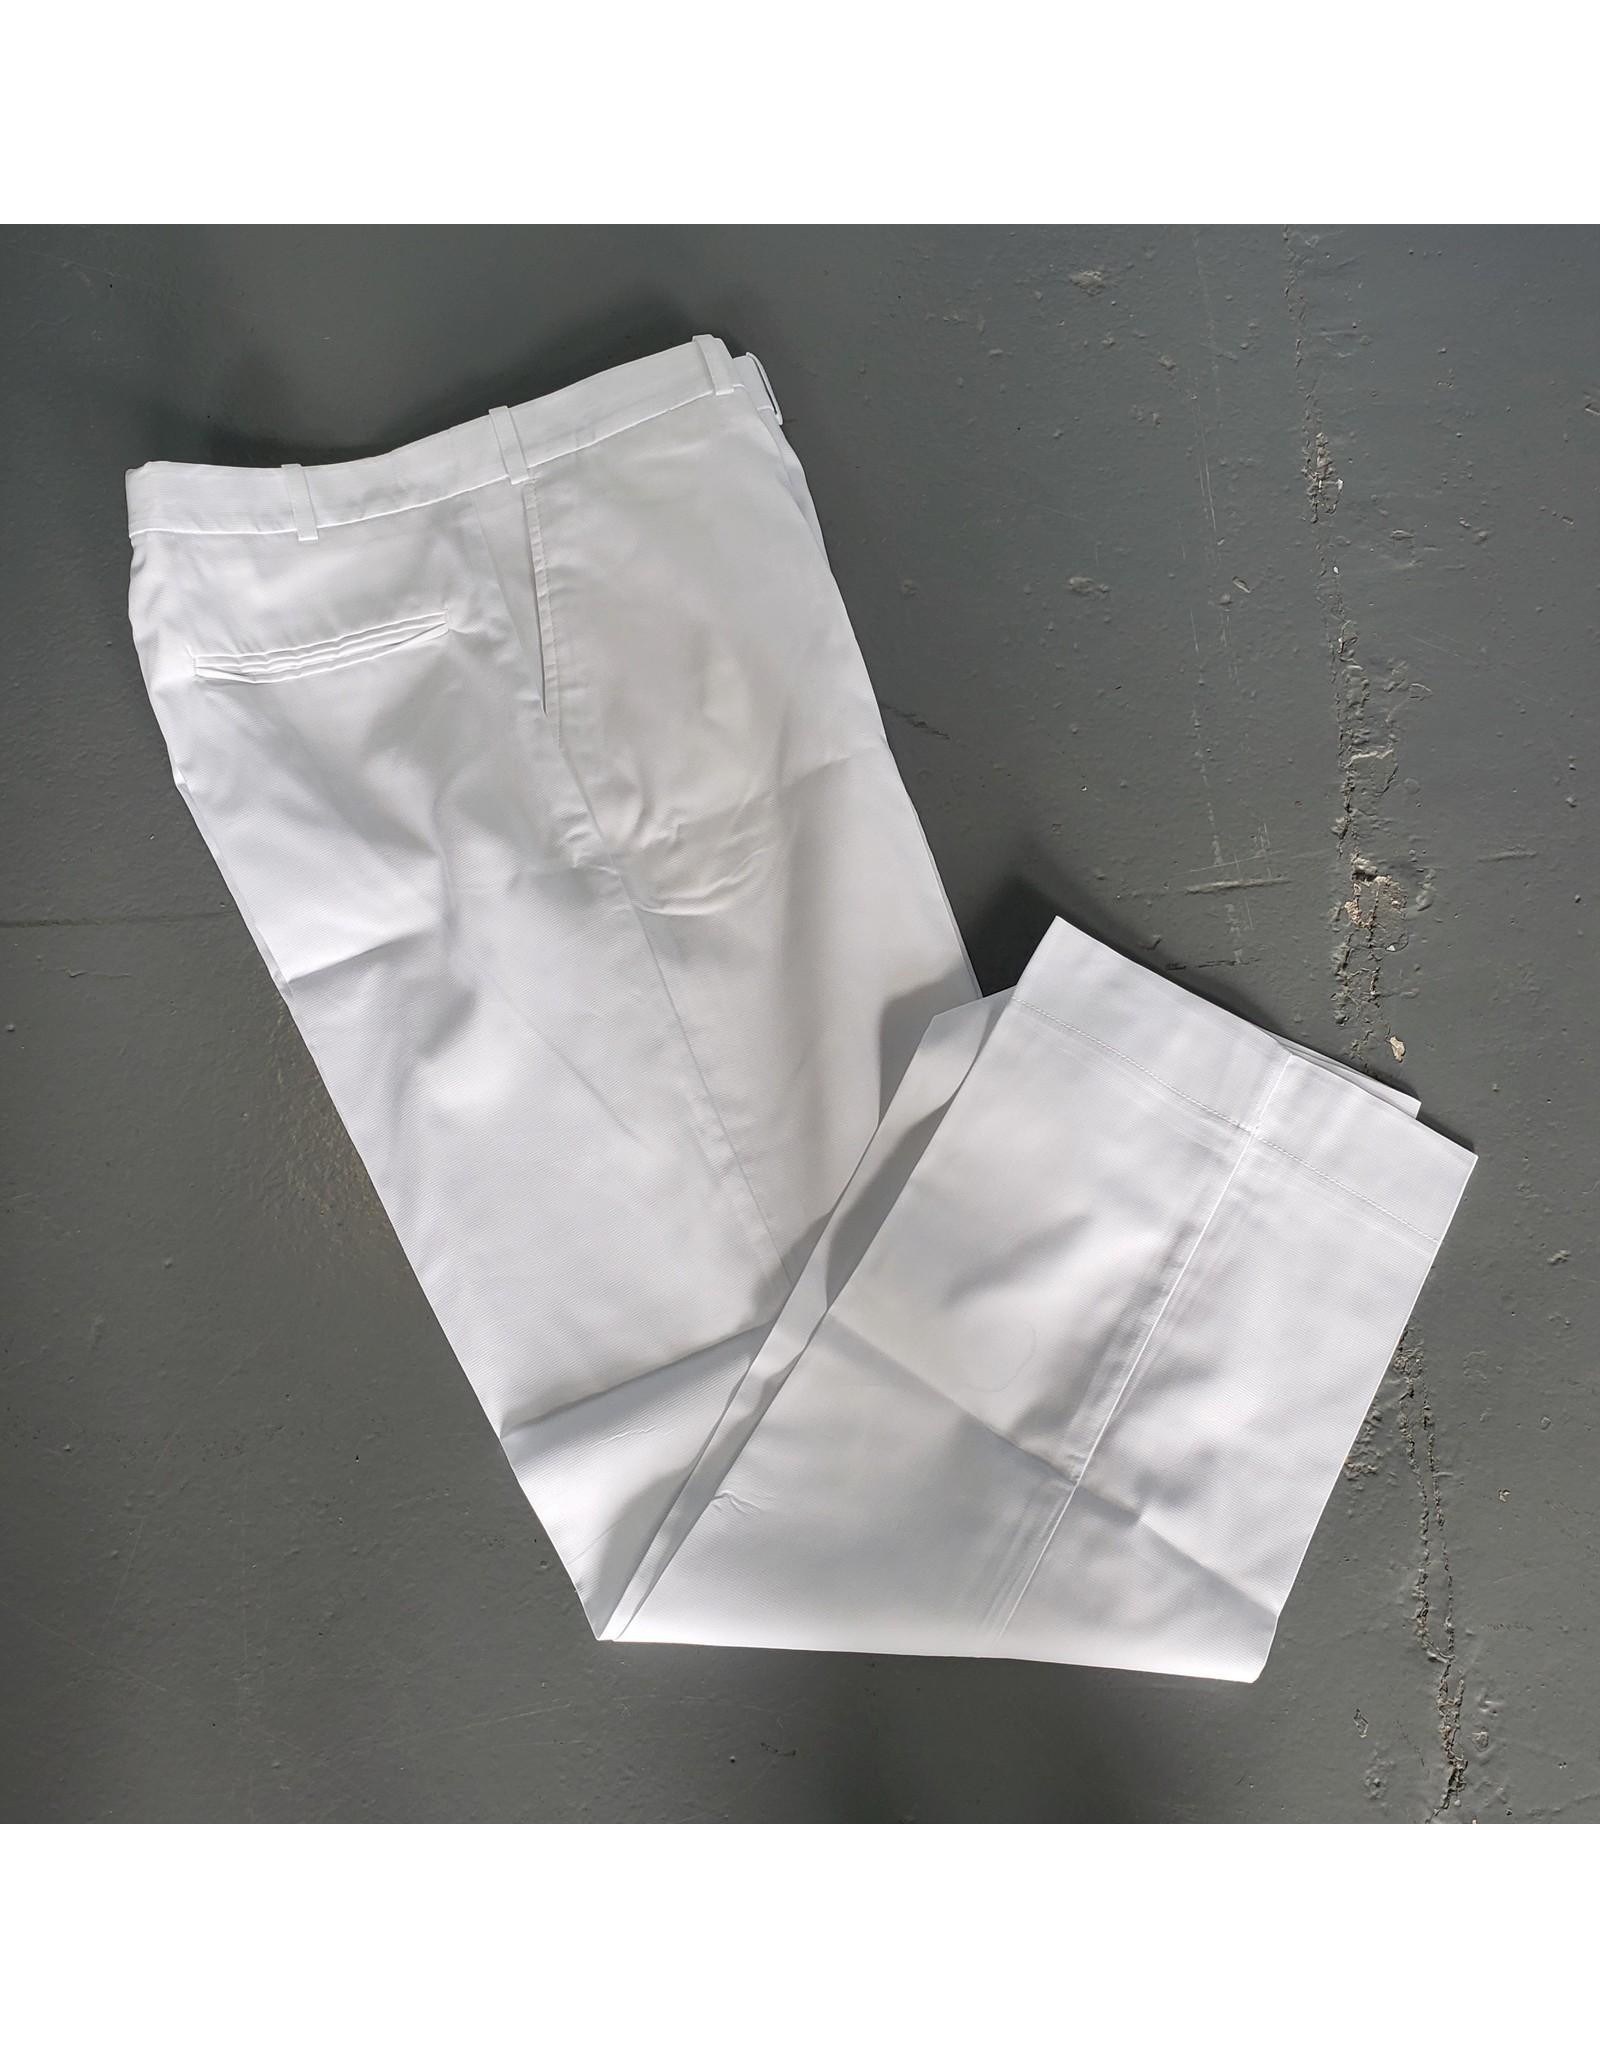 CANADIAN SURPLUS C.F. WHITE DRESS PANT-NEW